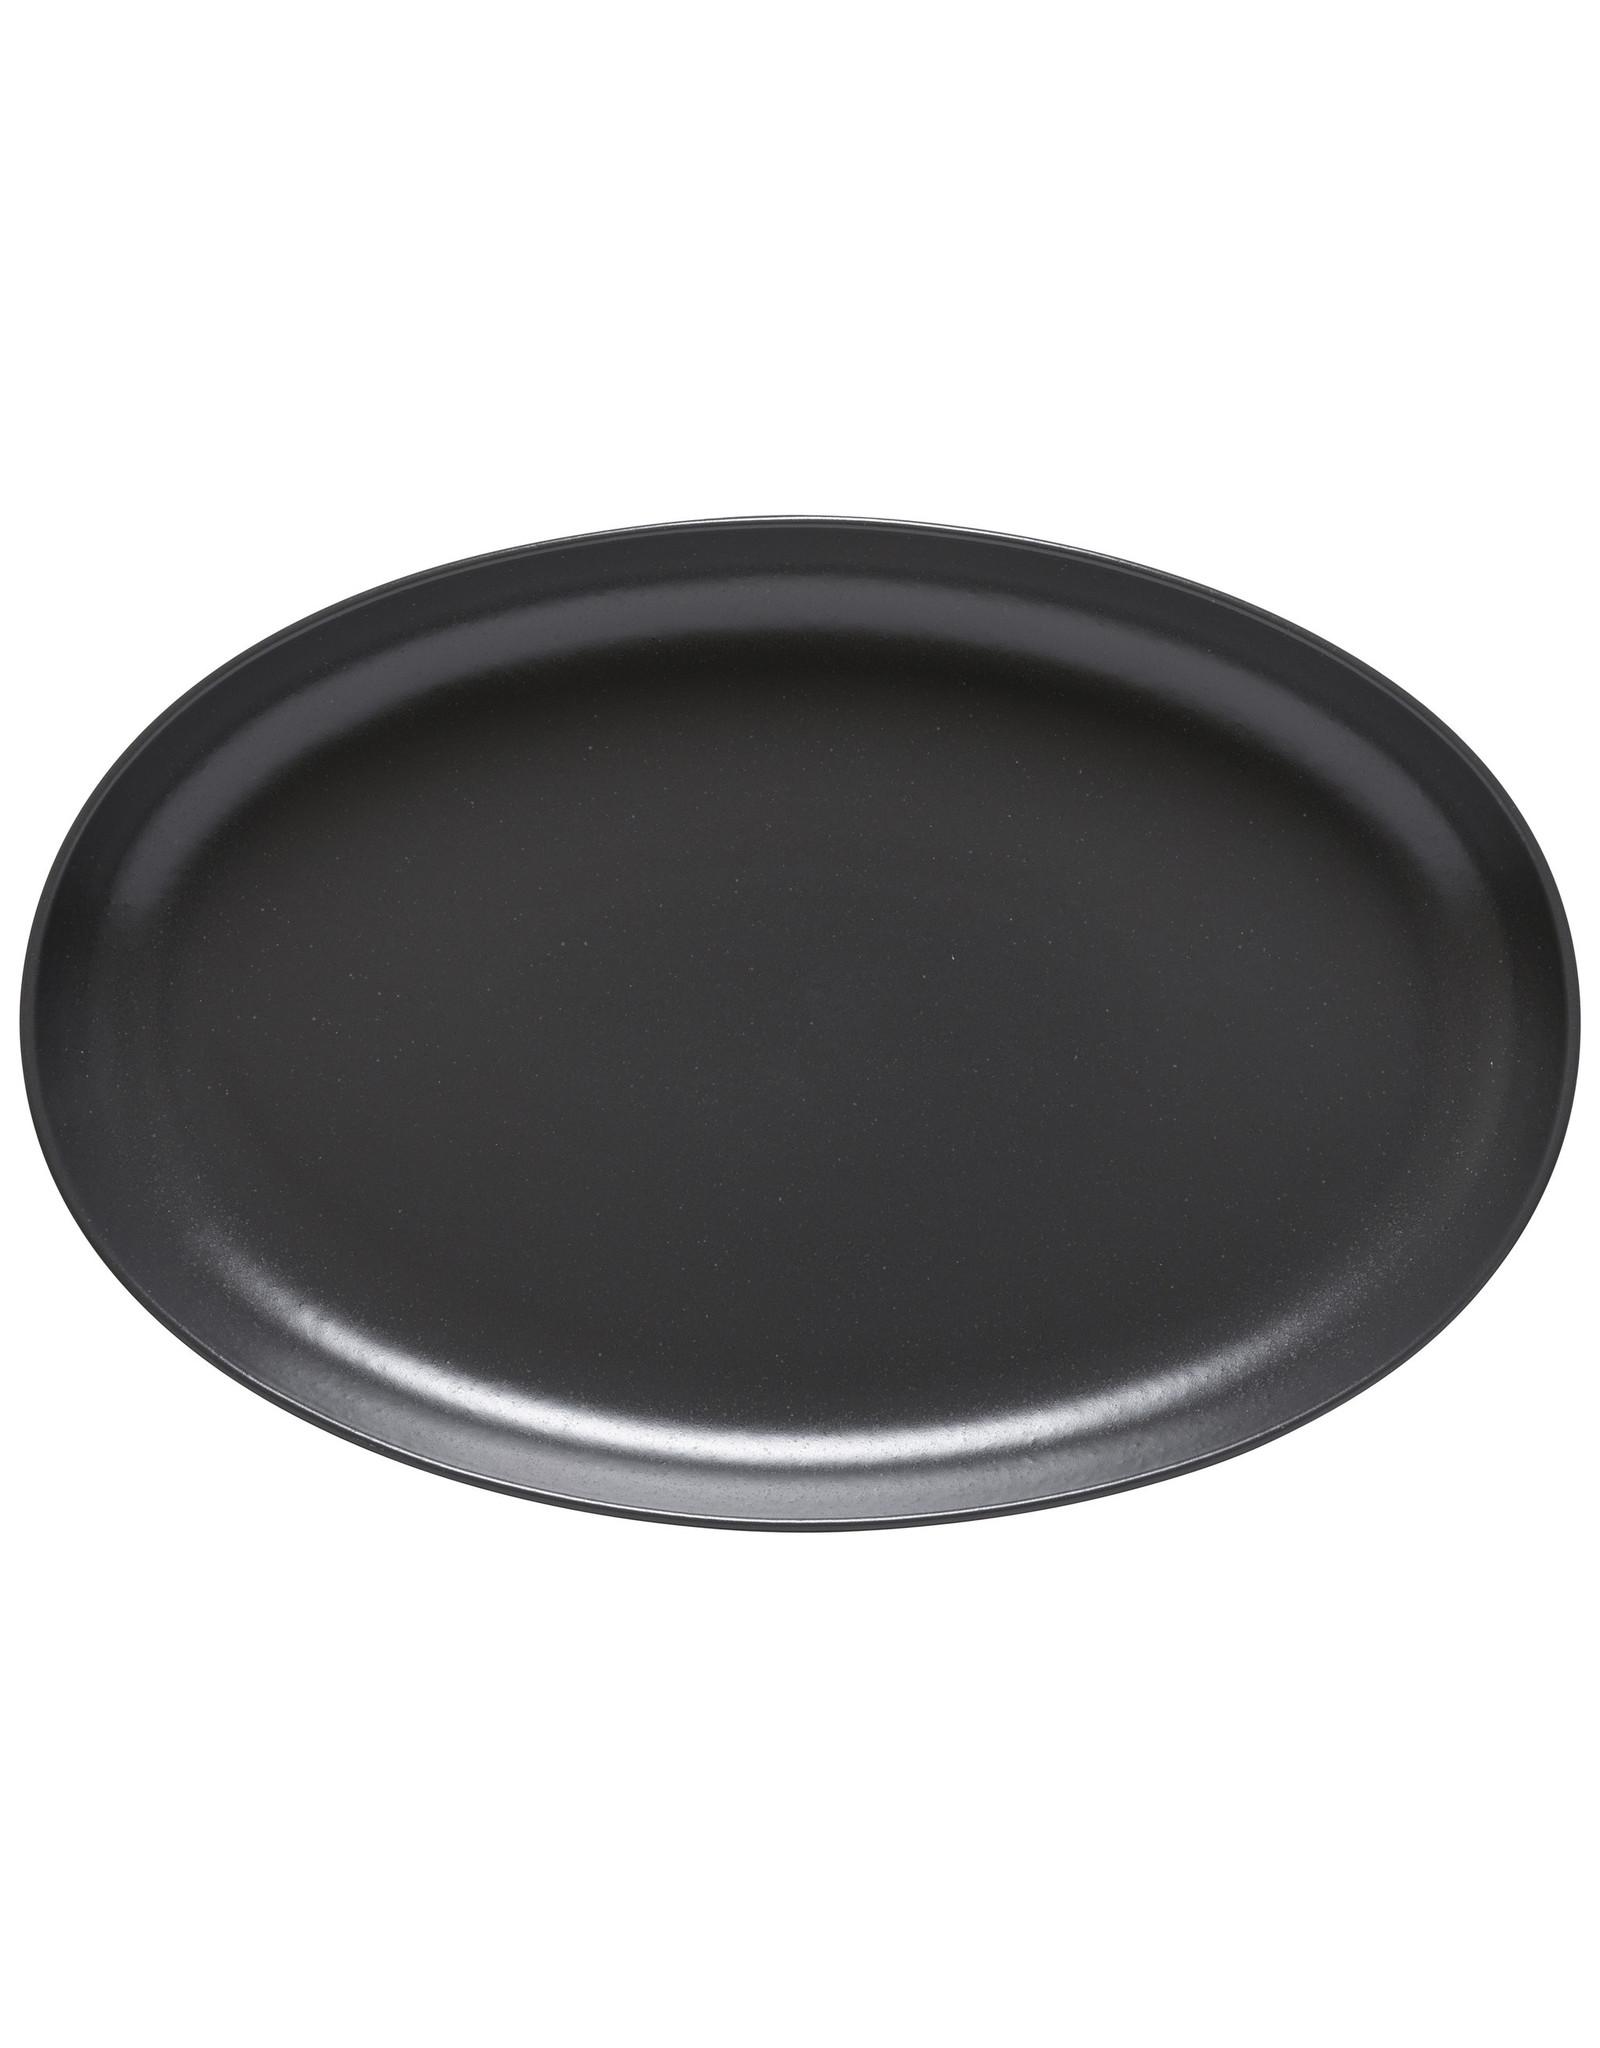 Kitchen Trend Ovale schaal 41cm Pacifica antraciet